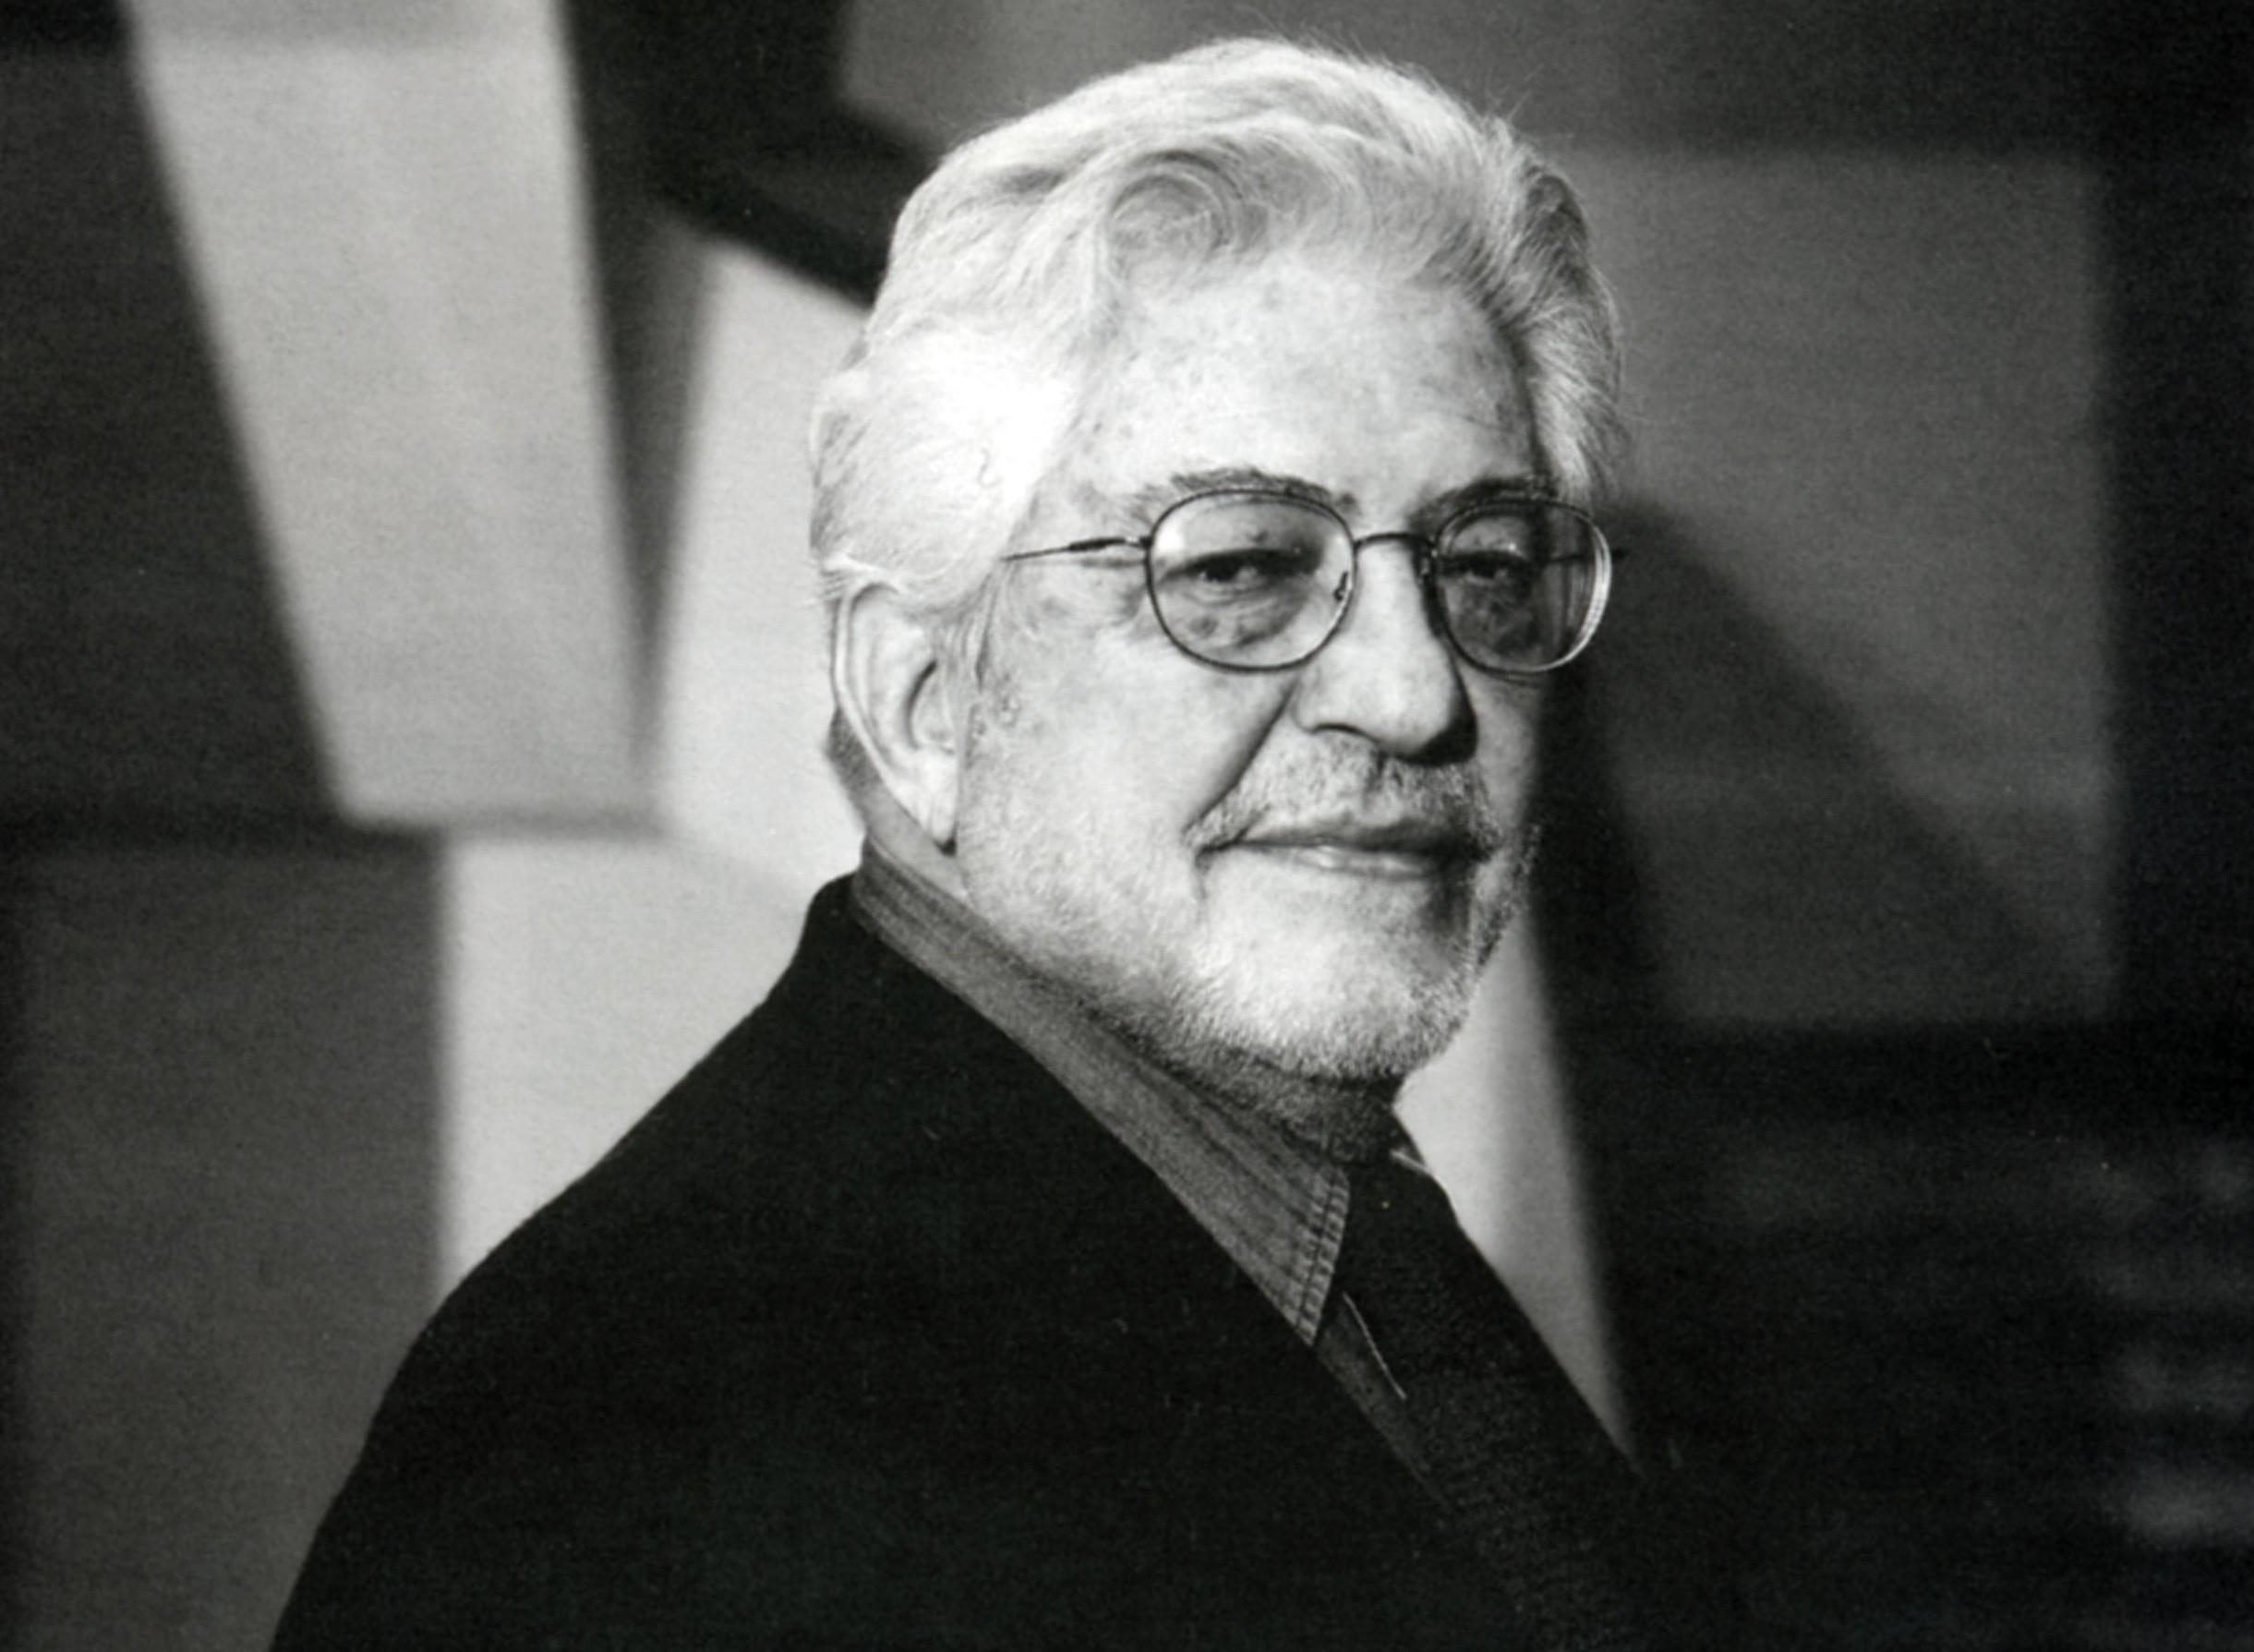 Scola, nei suoi film la storia d'Italia del dopoguerra (C1-C2)